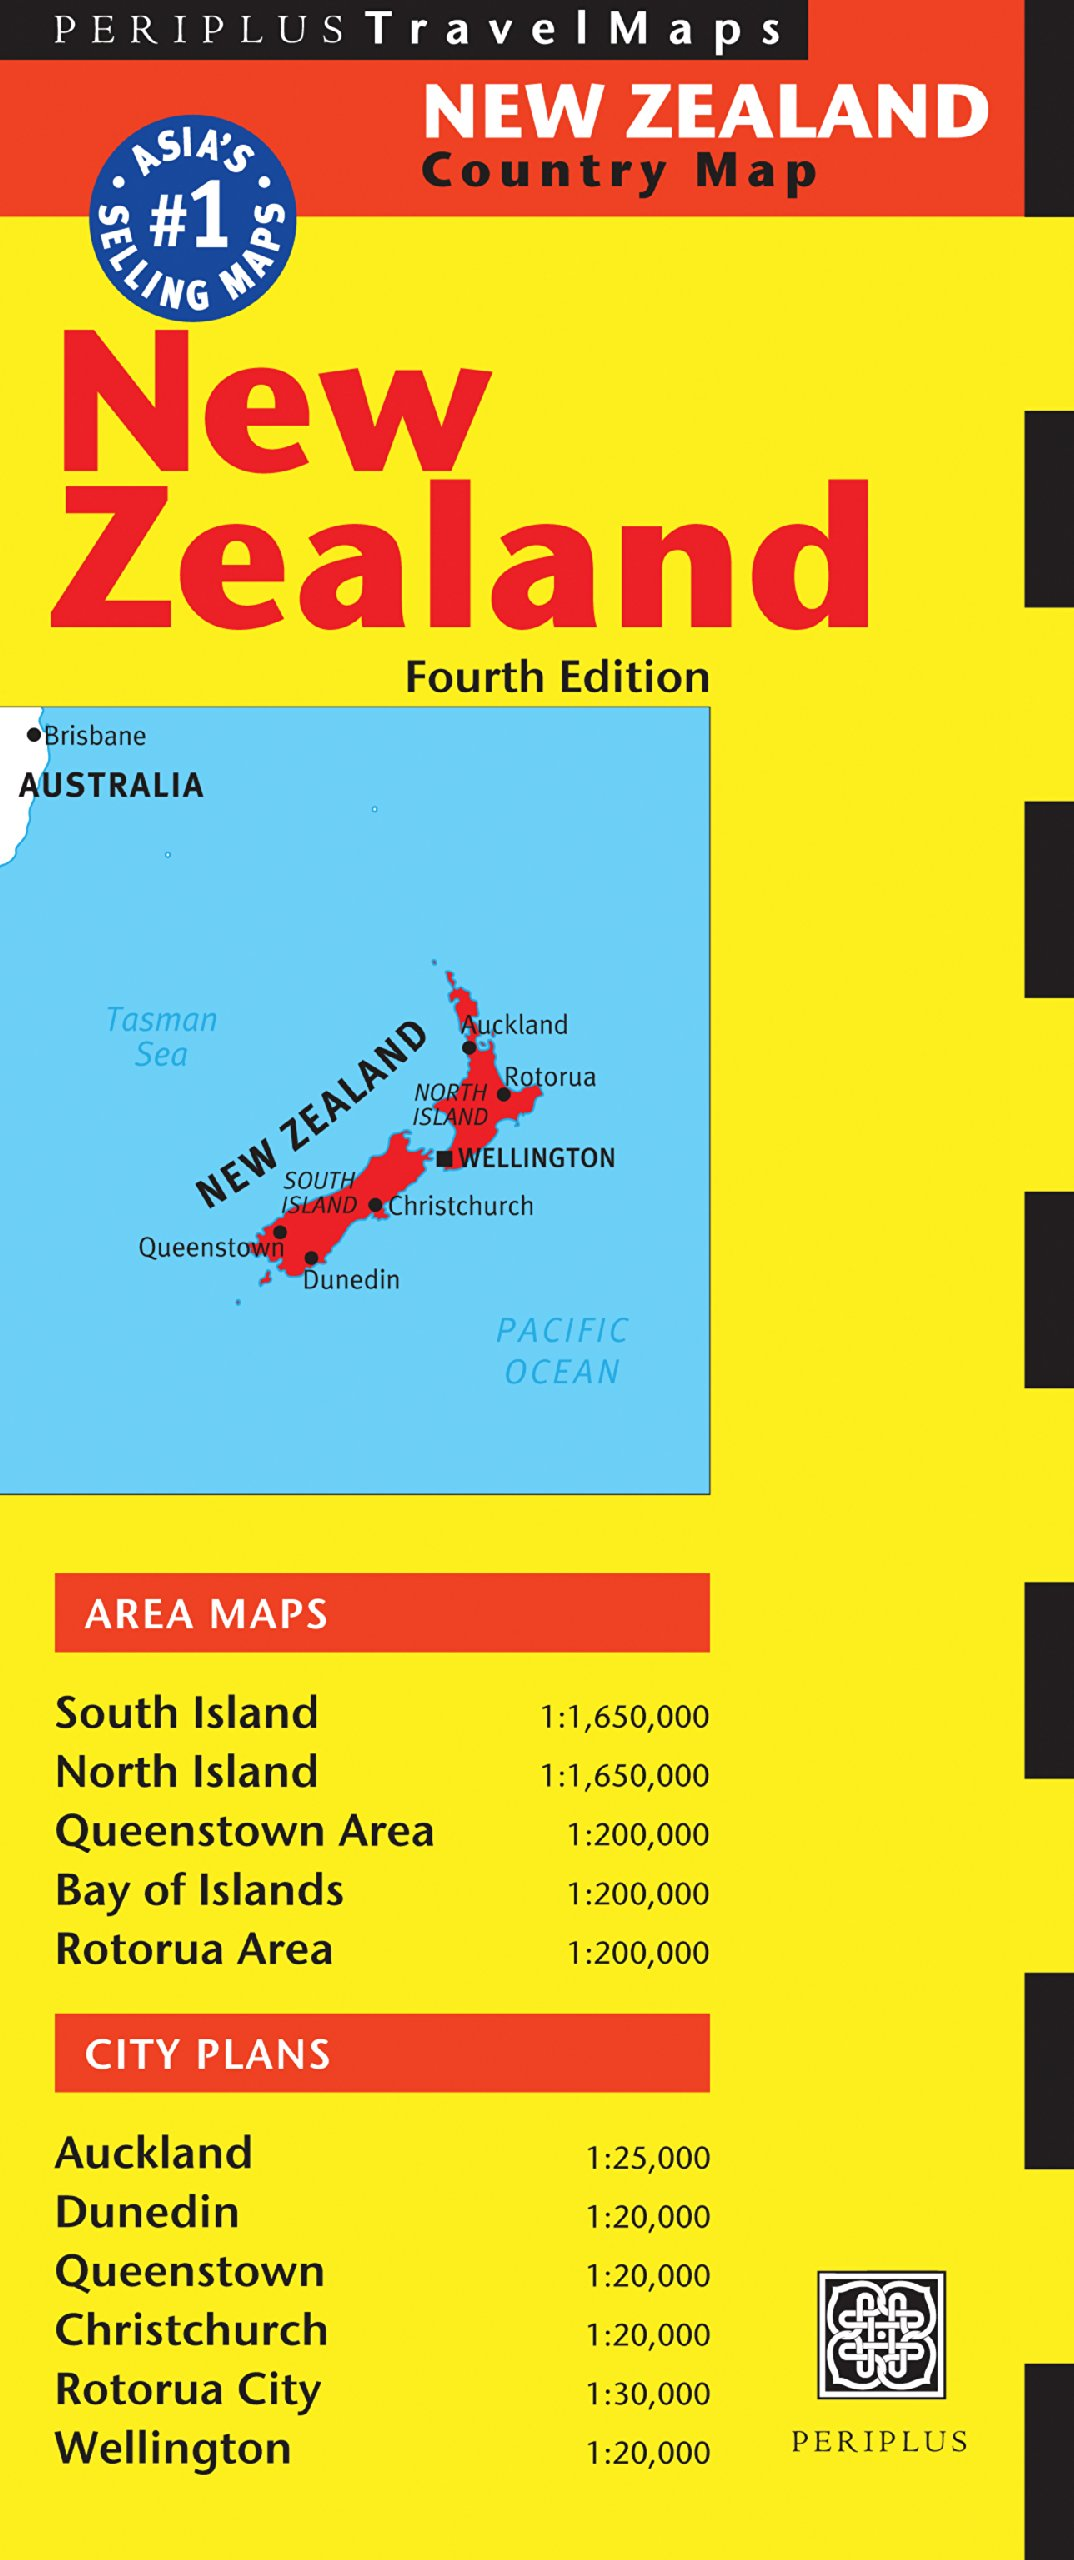 Map South New Zealand.New Zealand Travel Map Fourth Edition Australia Regional Maps